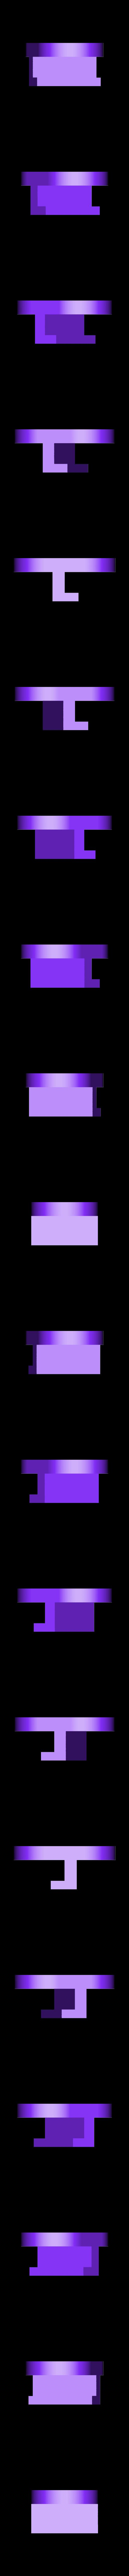 Batmobile_wall_mount_short.stl Download free SCAD file Lego Batmobile wall mount • 3D printable template, yvrogne59